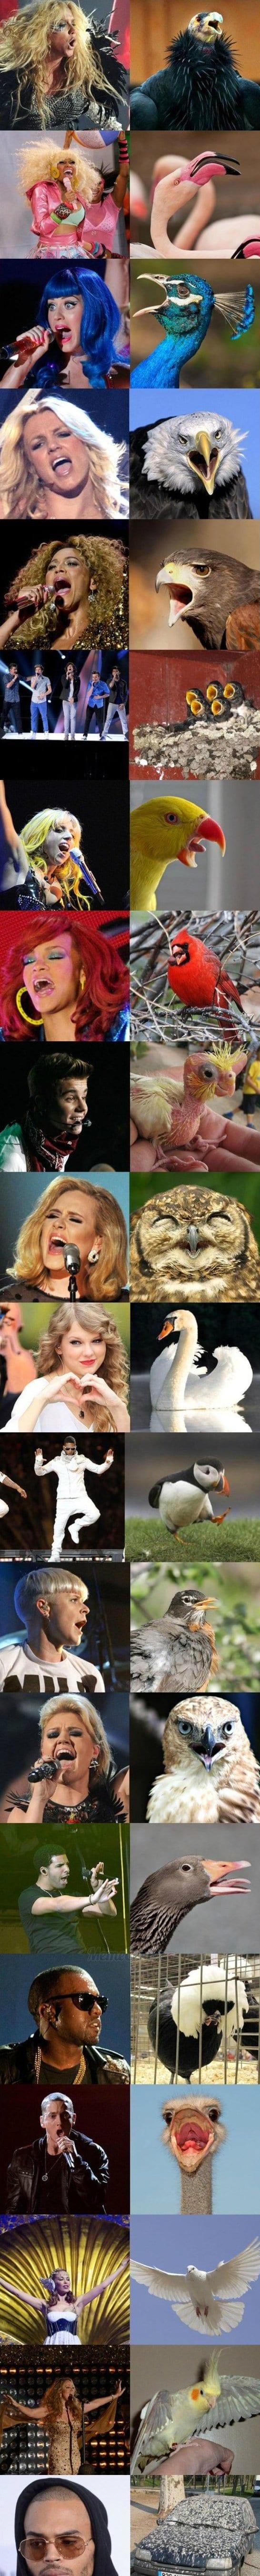 birds-looks-like-celebirties